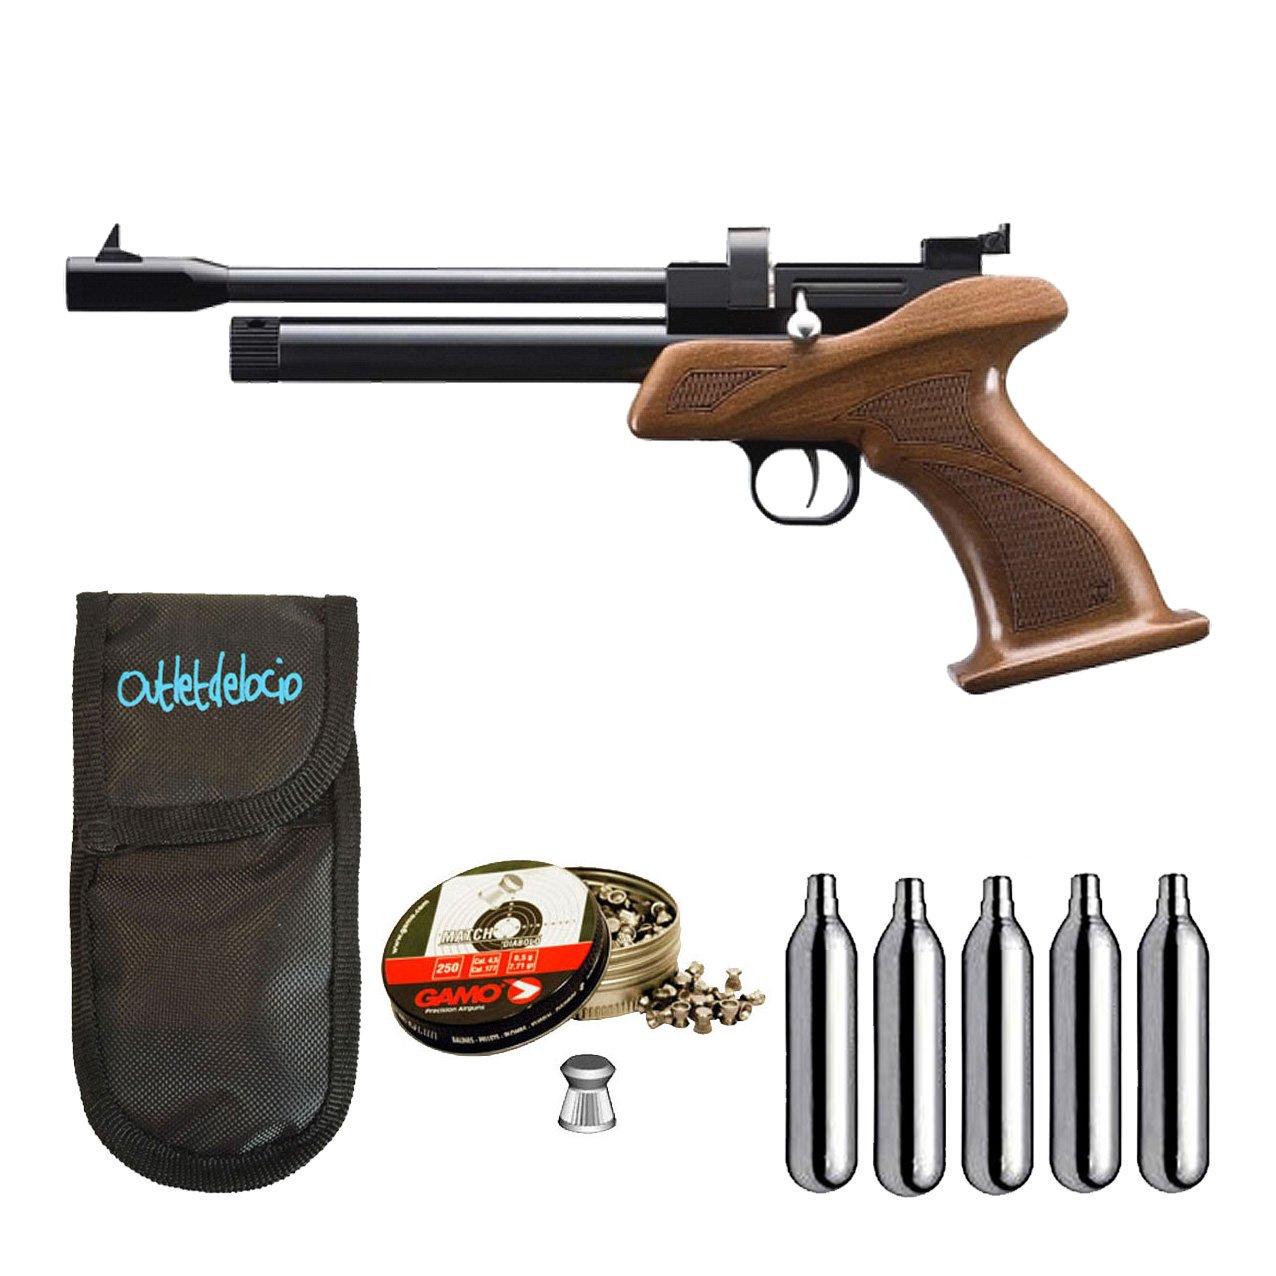 Pistola perdigon ZCP1M55 Zasdar CP1 co2 5, 5 mm+ Funda Portabombonas + Balines + Bombonas co2. 23054/29318/36580